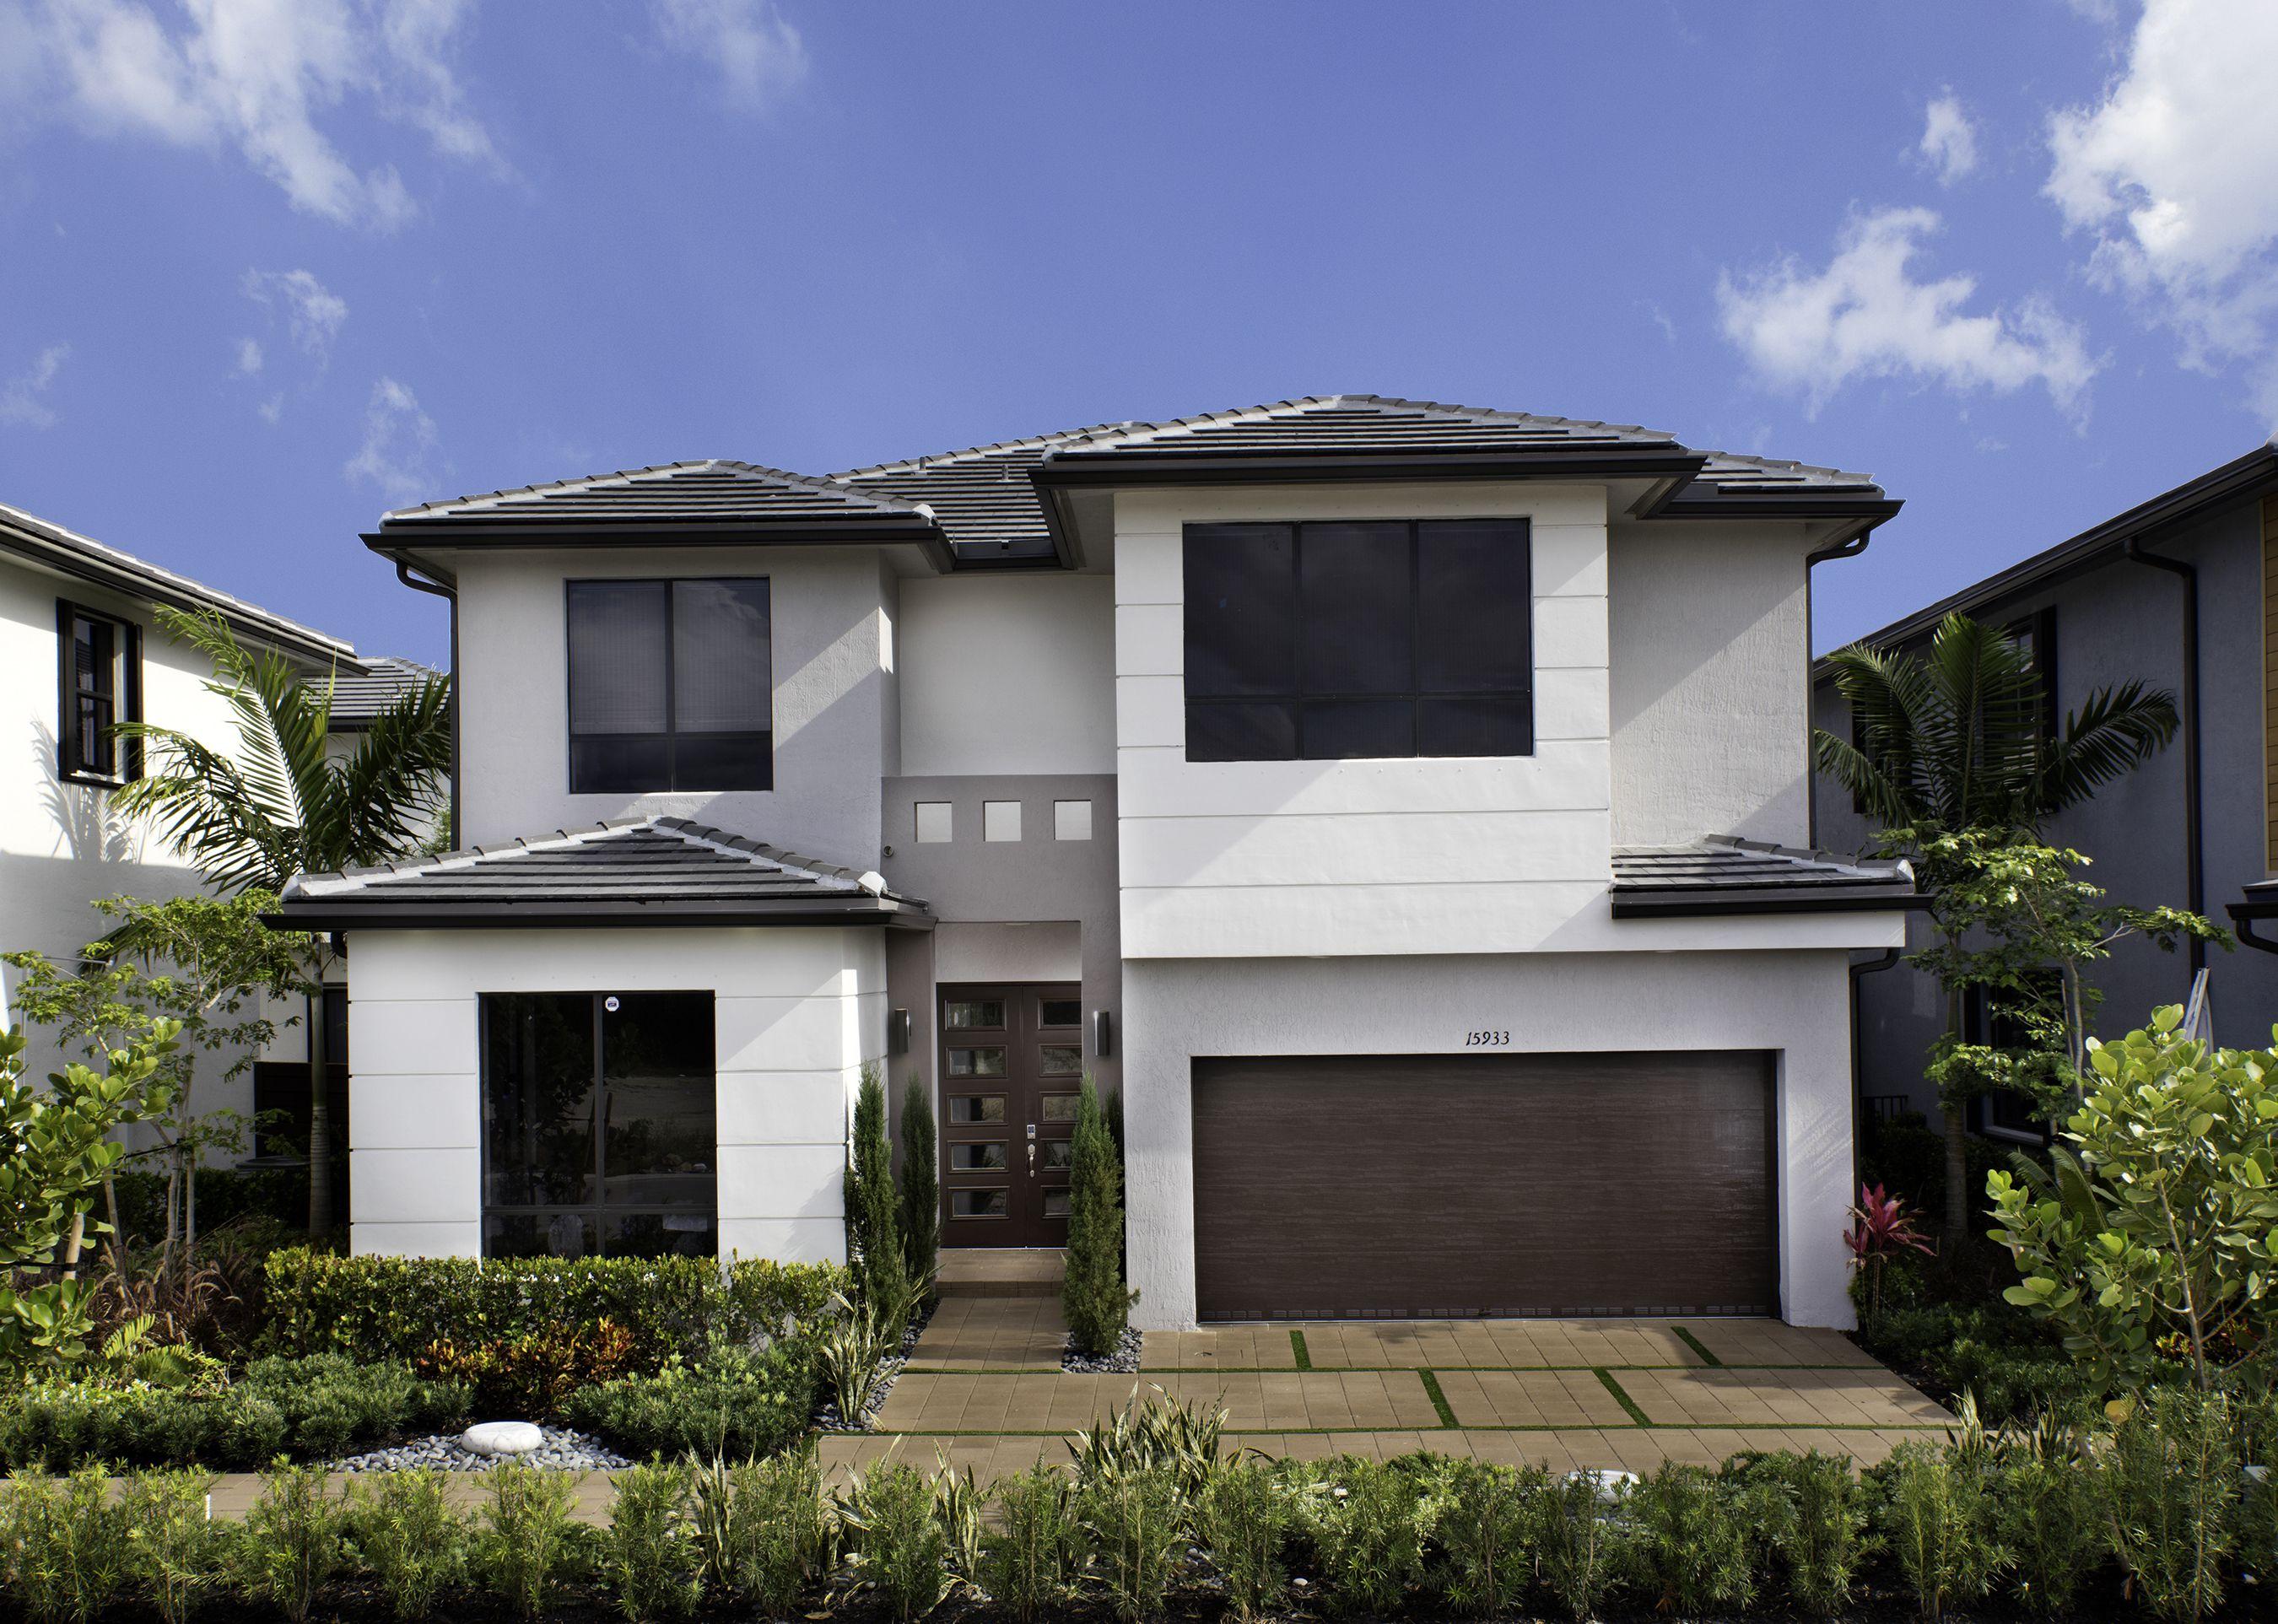 Serenity S Retreat In Miami 2 Story 5 Br 3 5 Ba 2 Car Garage